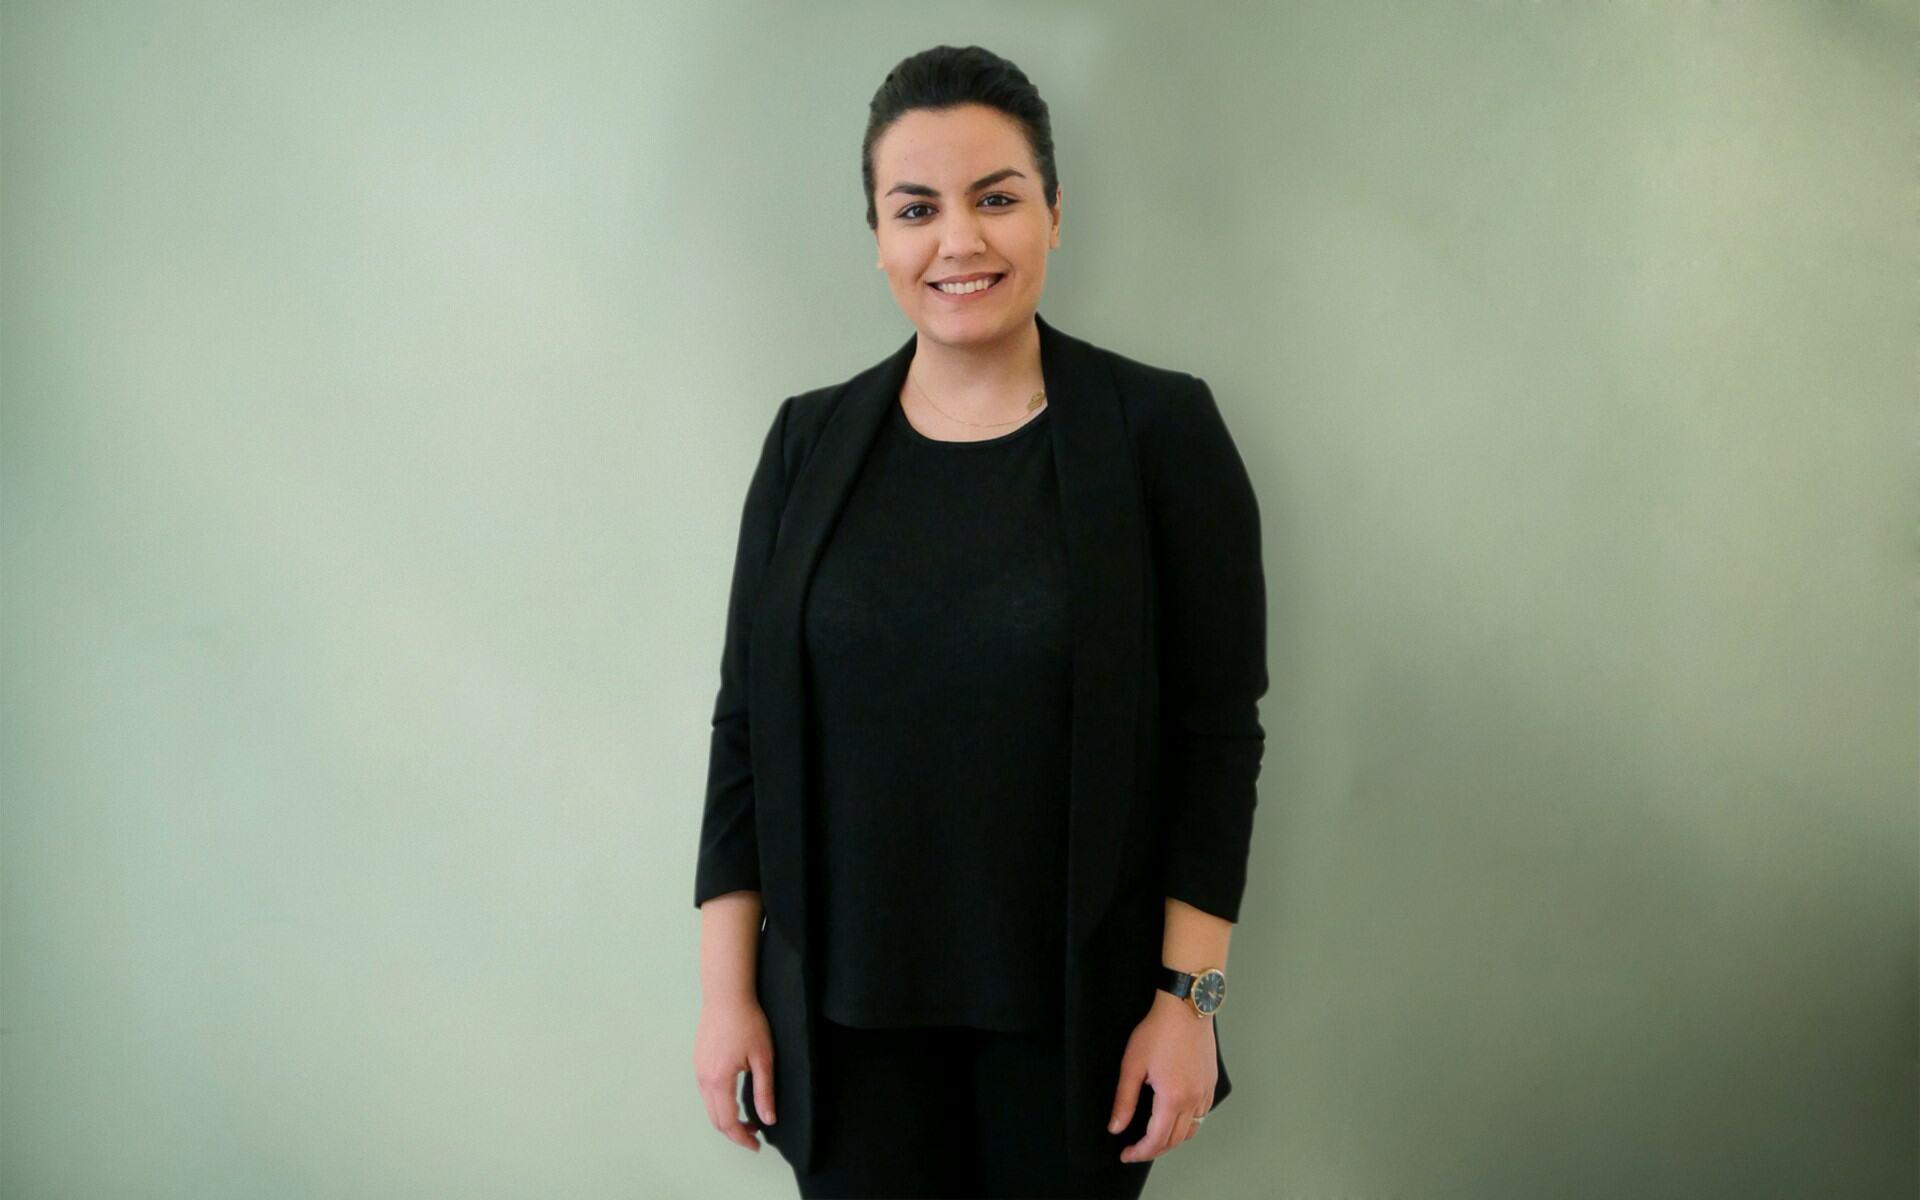 Setareh Shafii Tabatabai, Mitglied der Staatsbad Philharmonie Kissingen